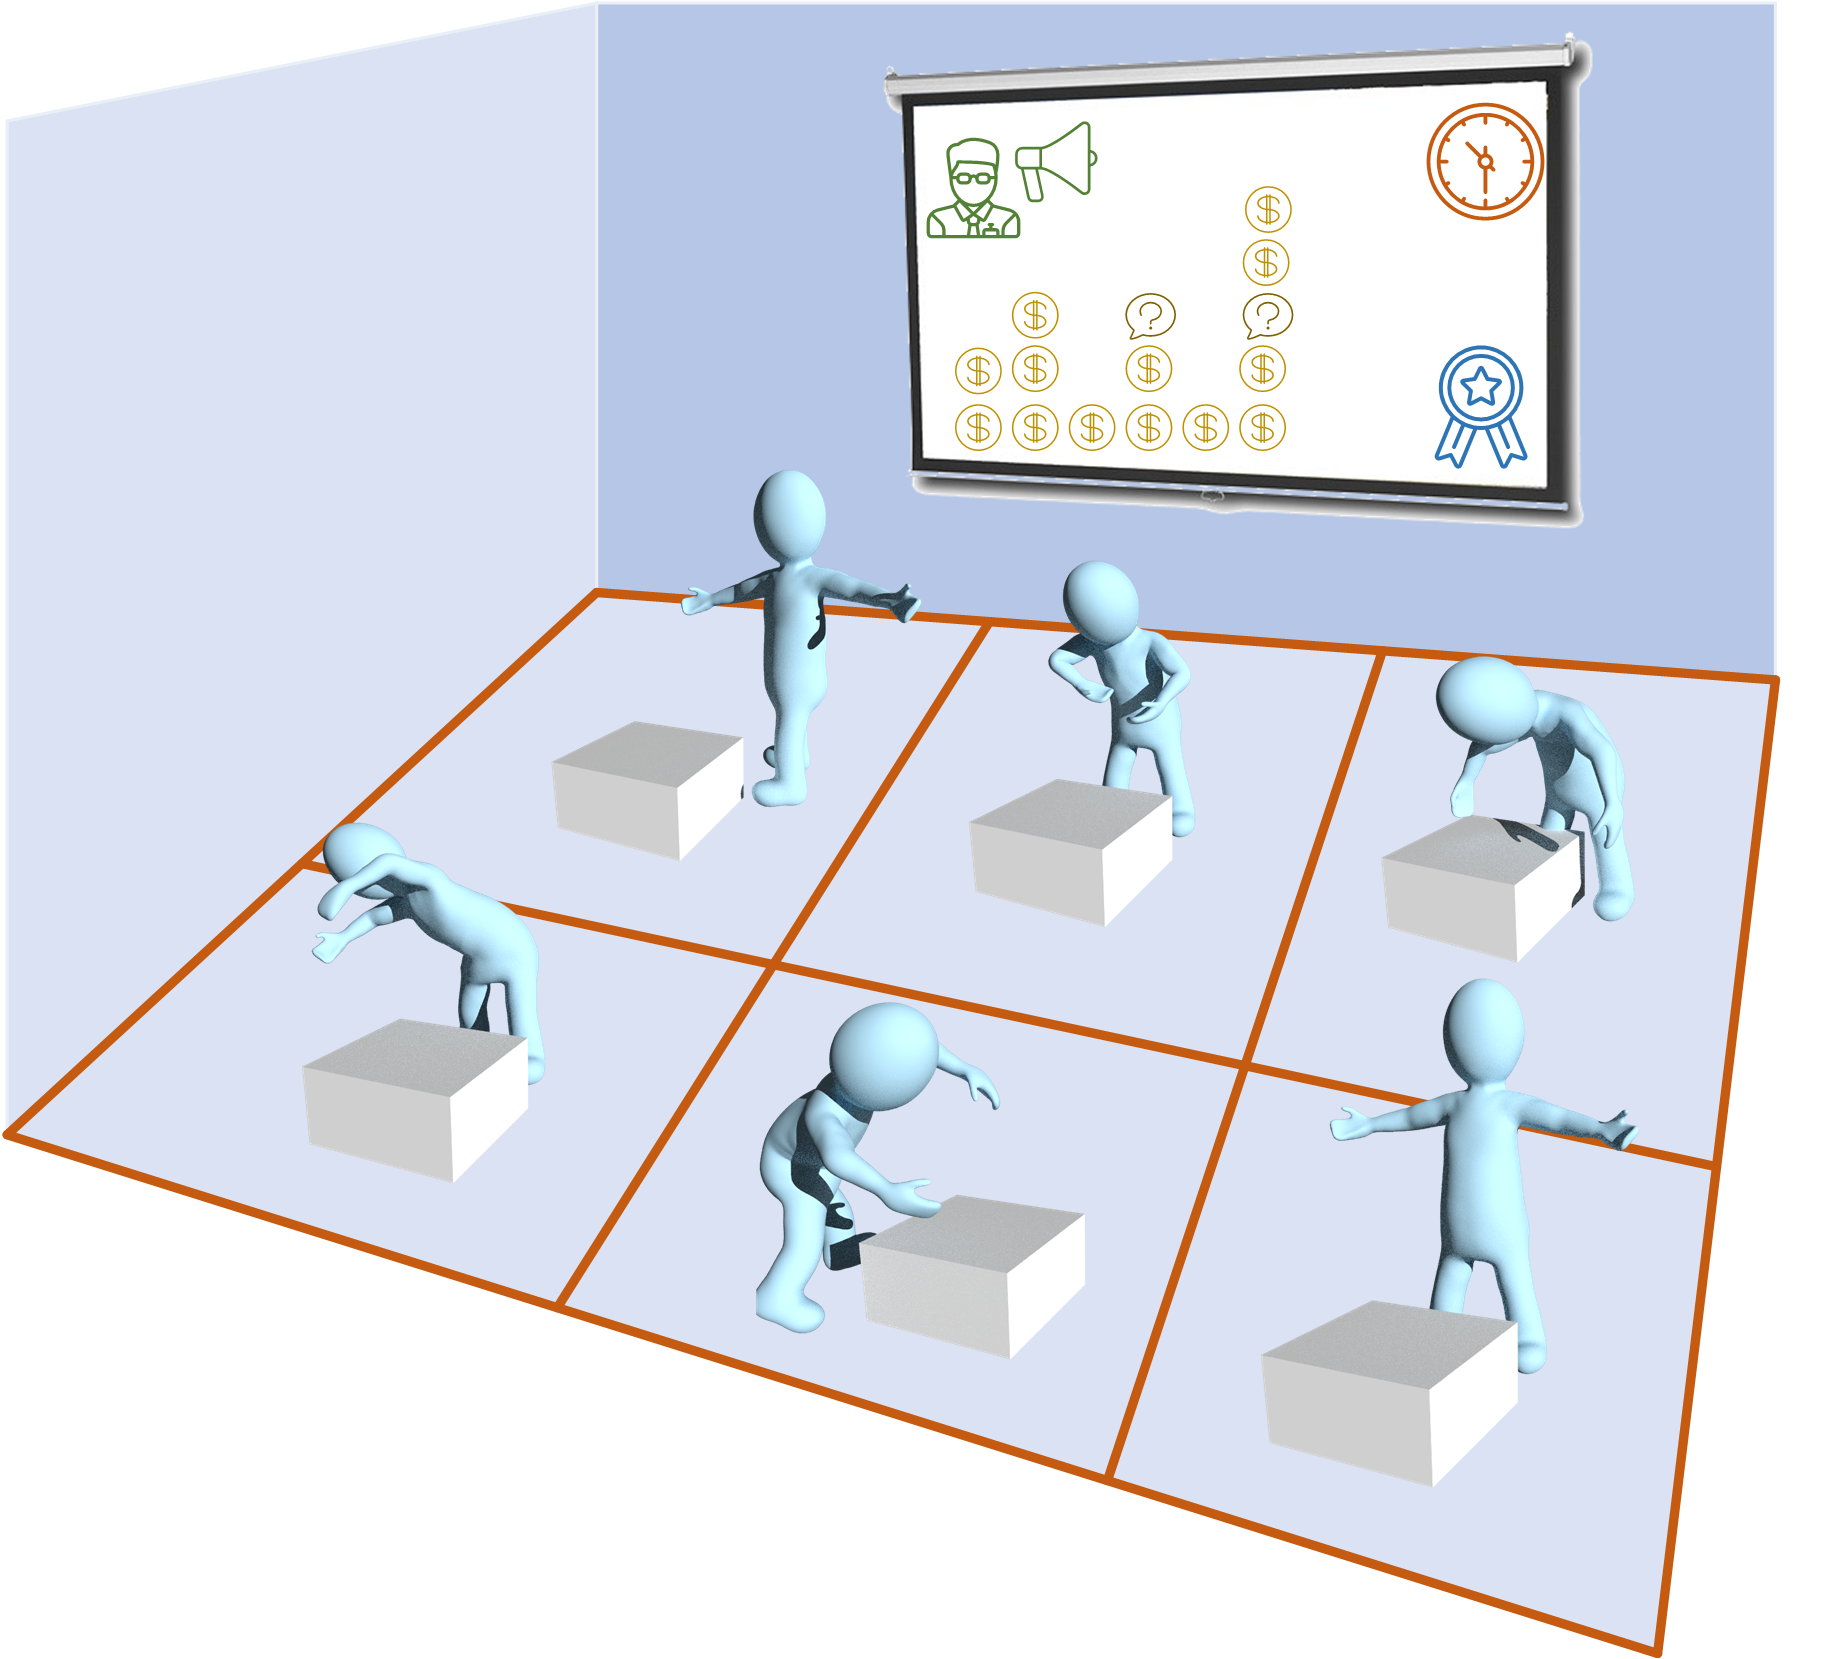 Cyber physical training studio